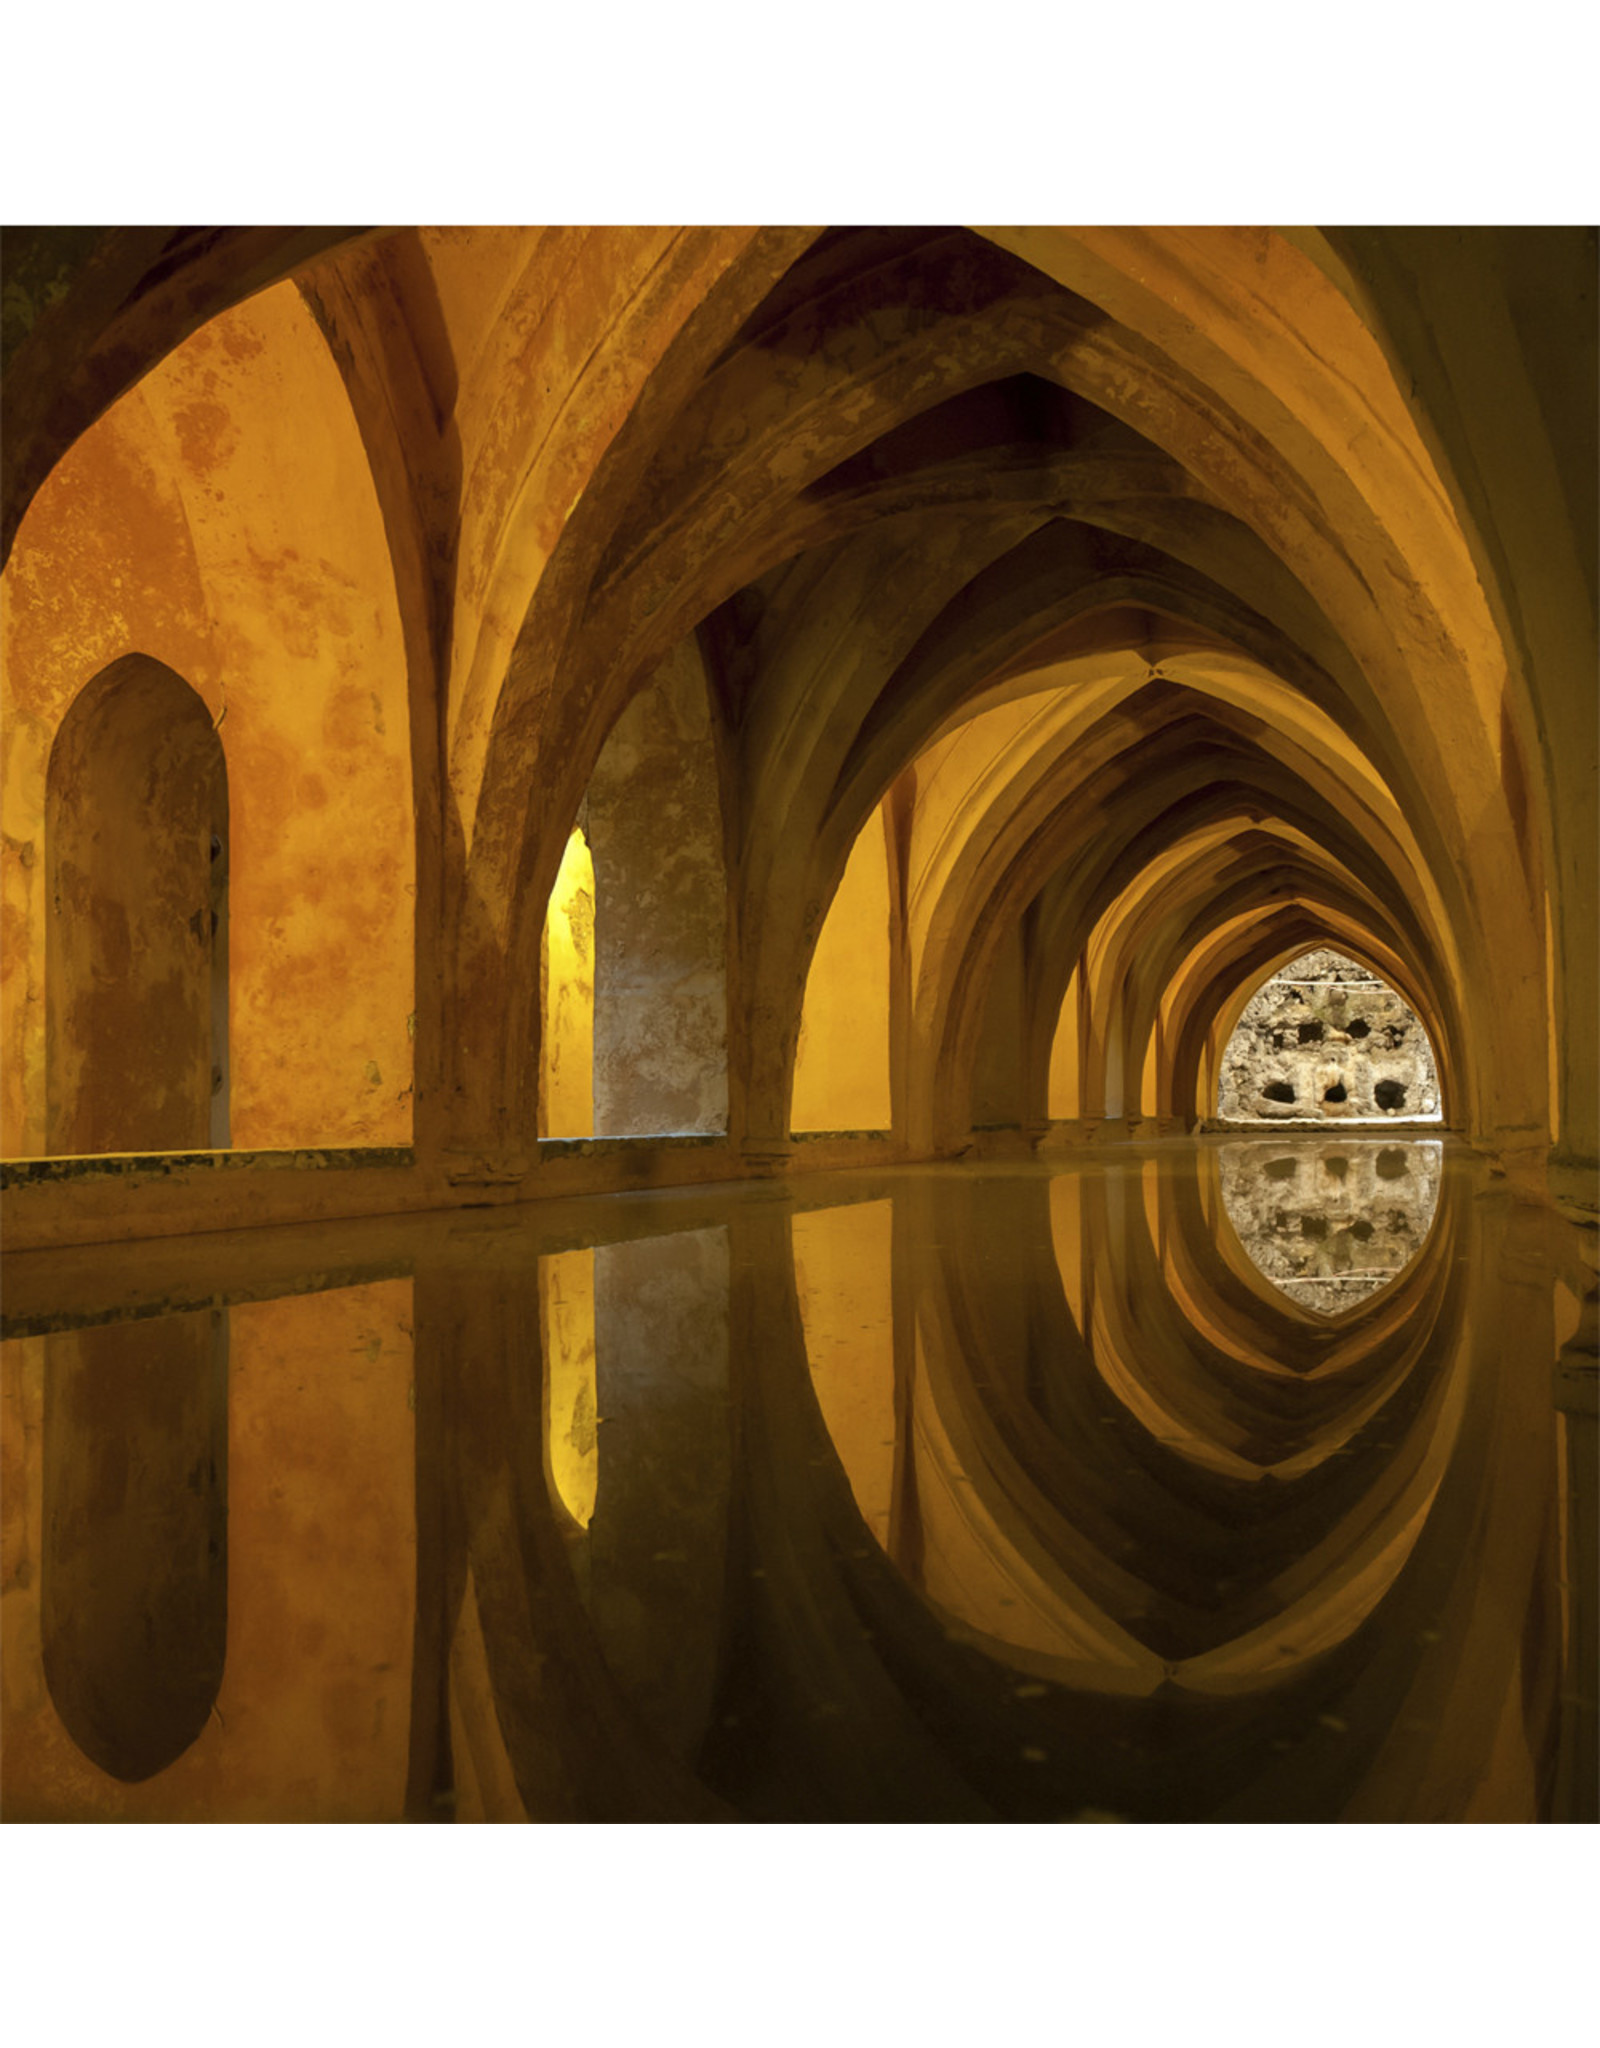 Zen Art & Design Bath in Alcazar (Sm, 126 Pieces, ZEN Wooden Jigsaw Puzzle)